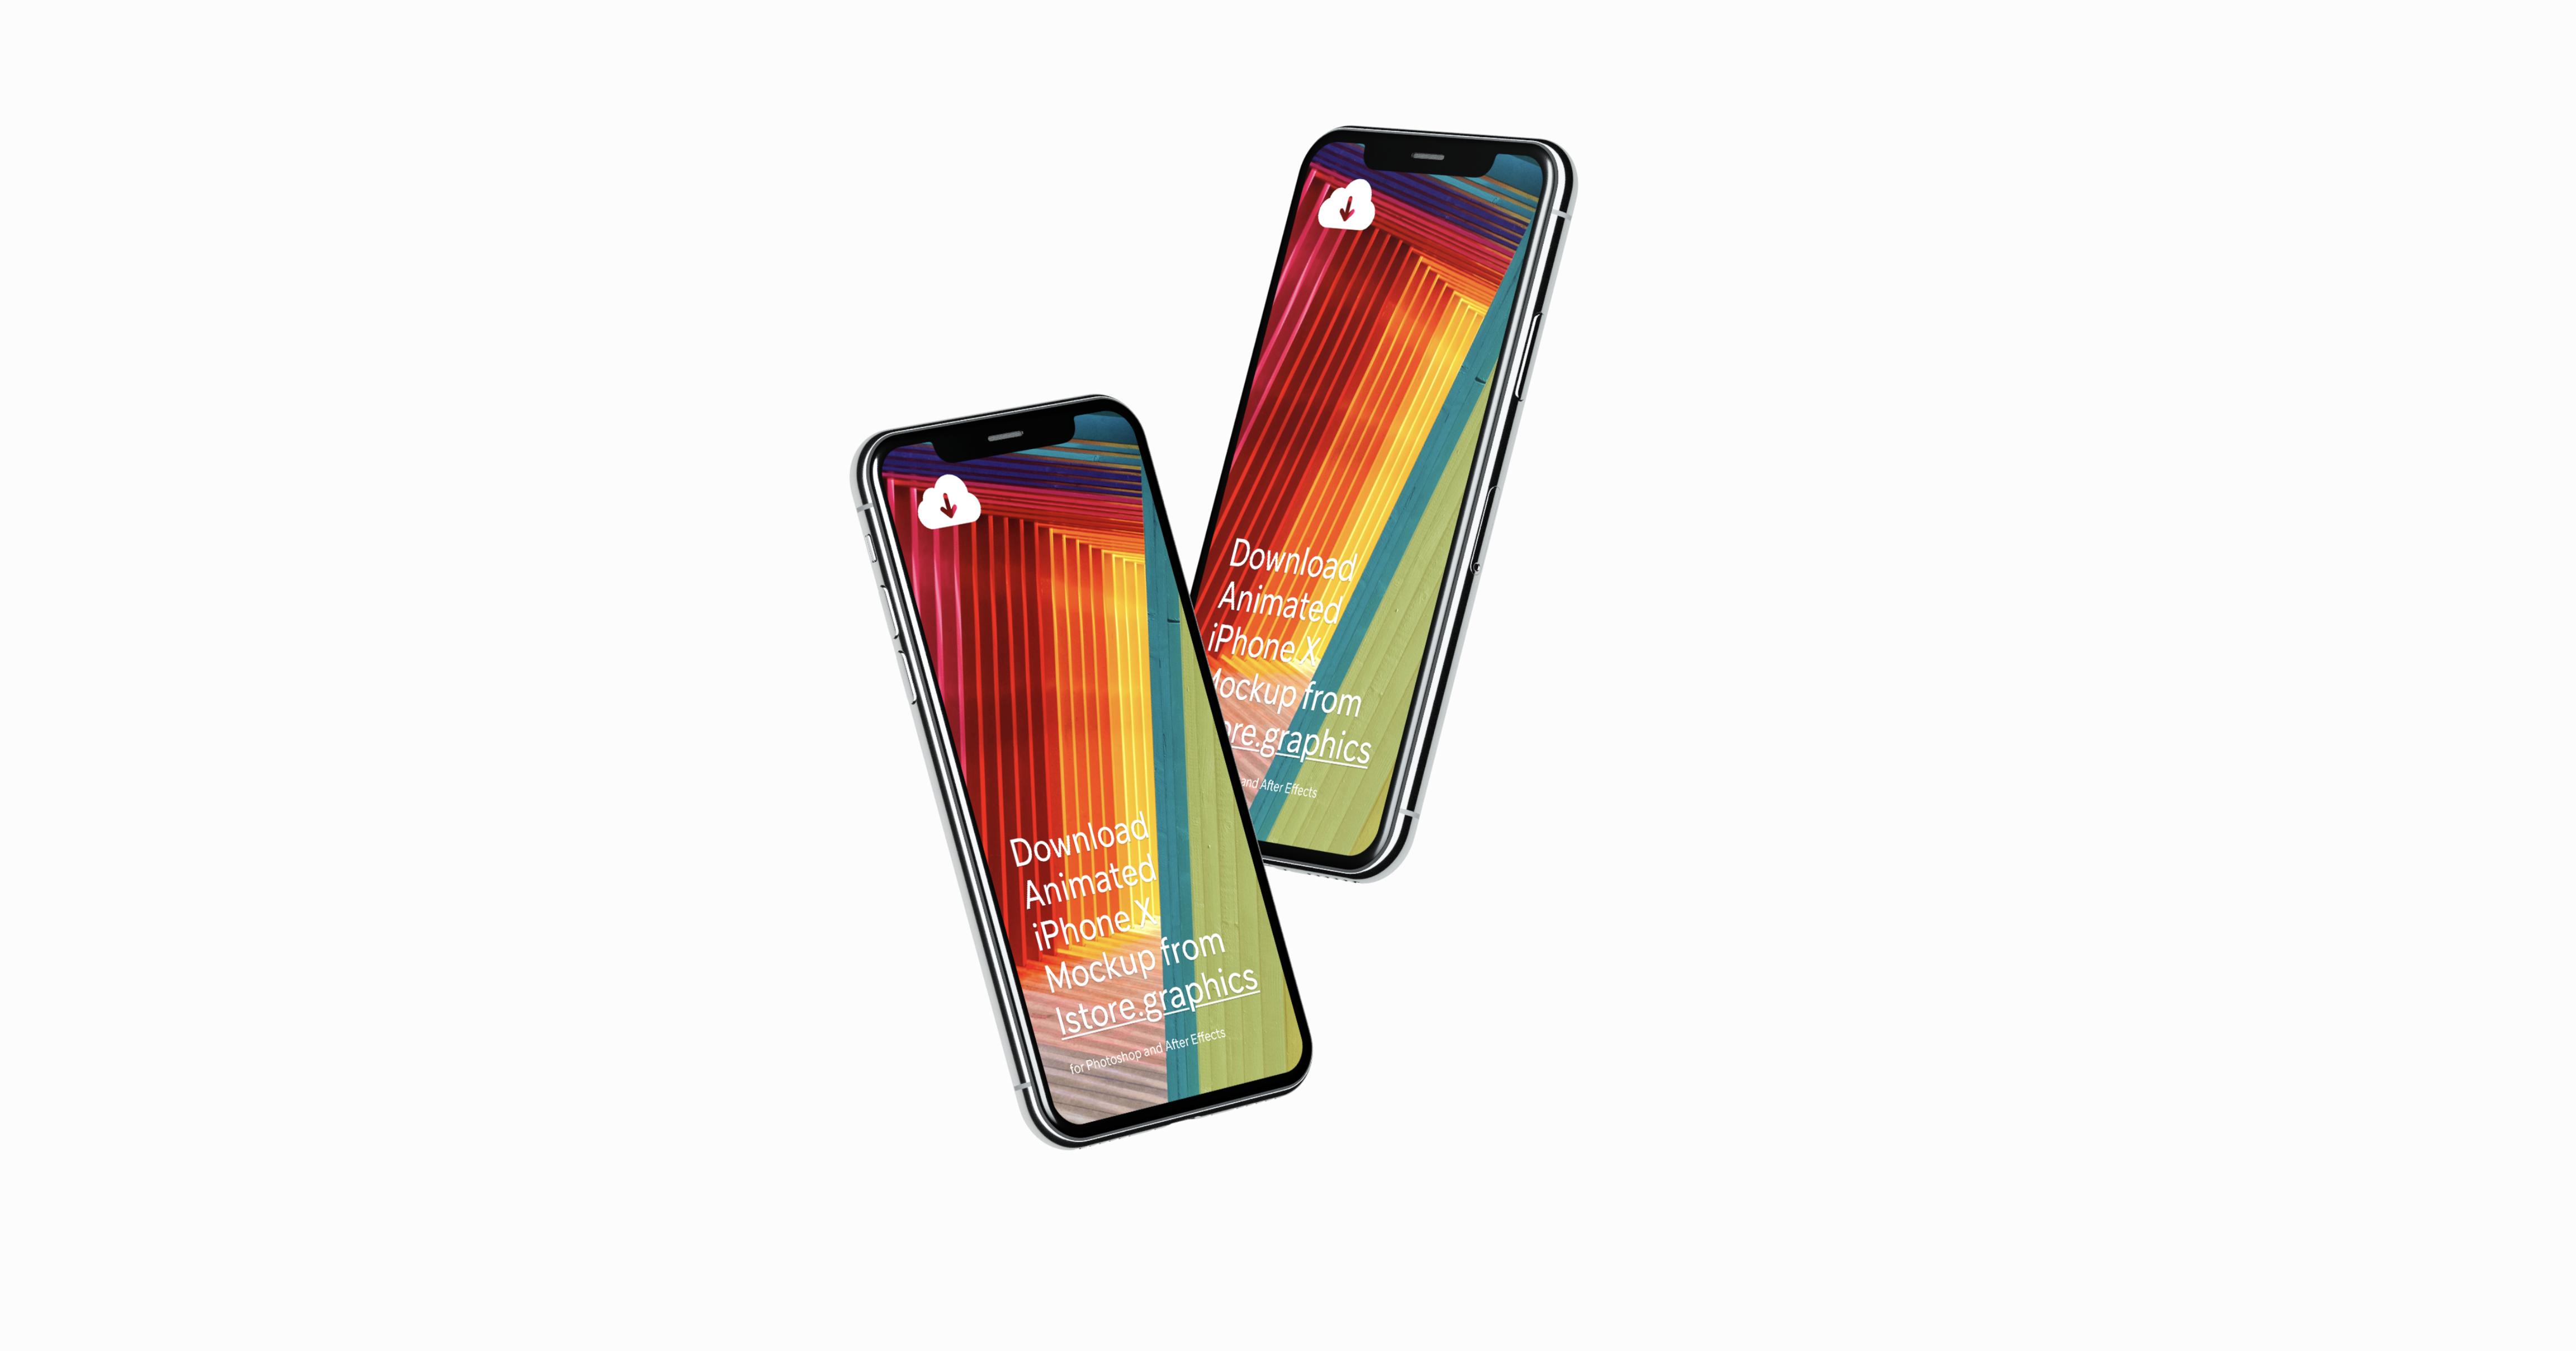 iPhone X Mockups 4k Resolution